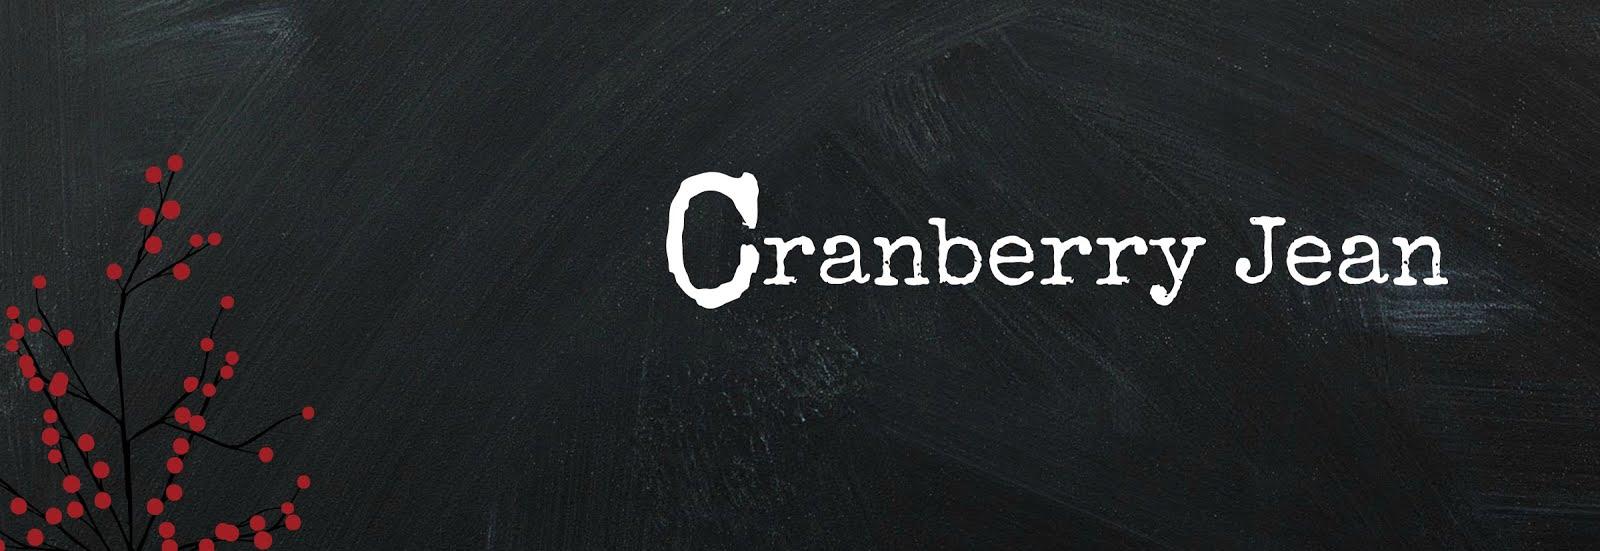 Cranberry Jean